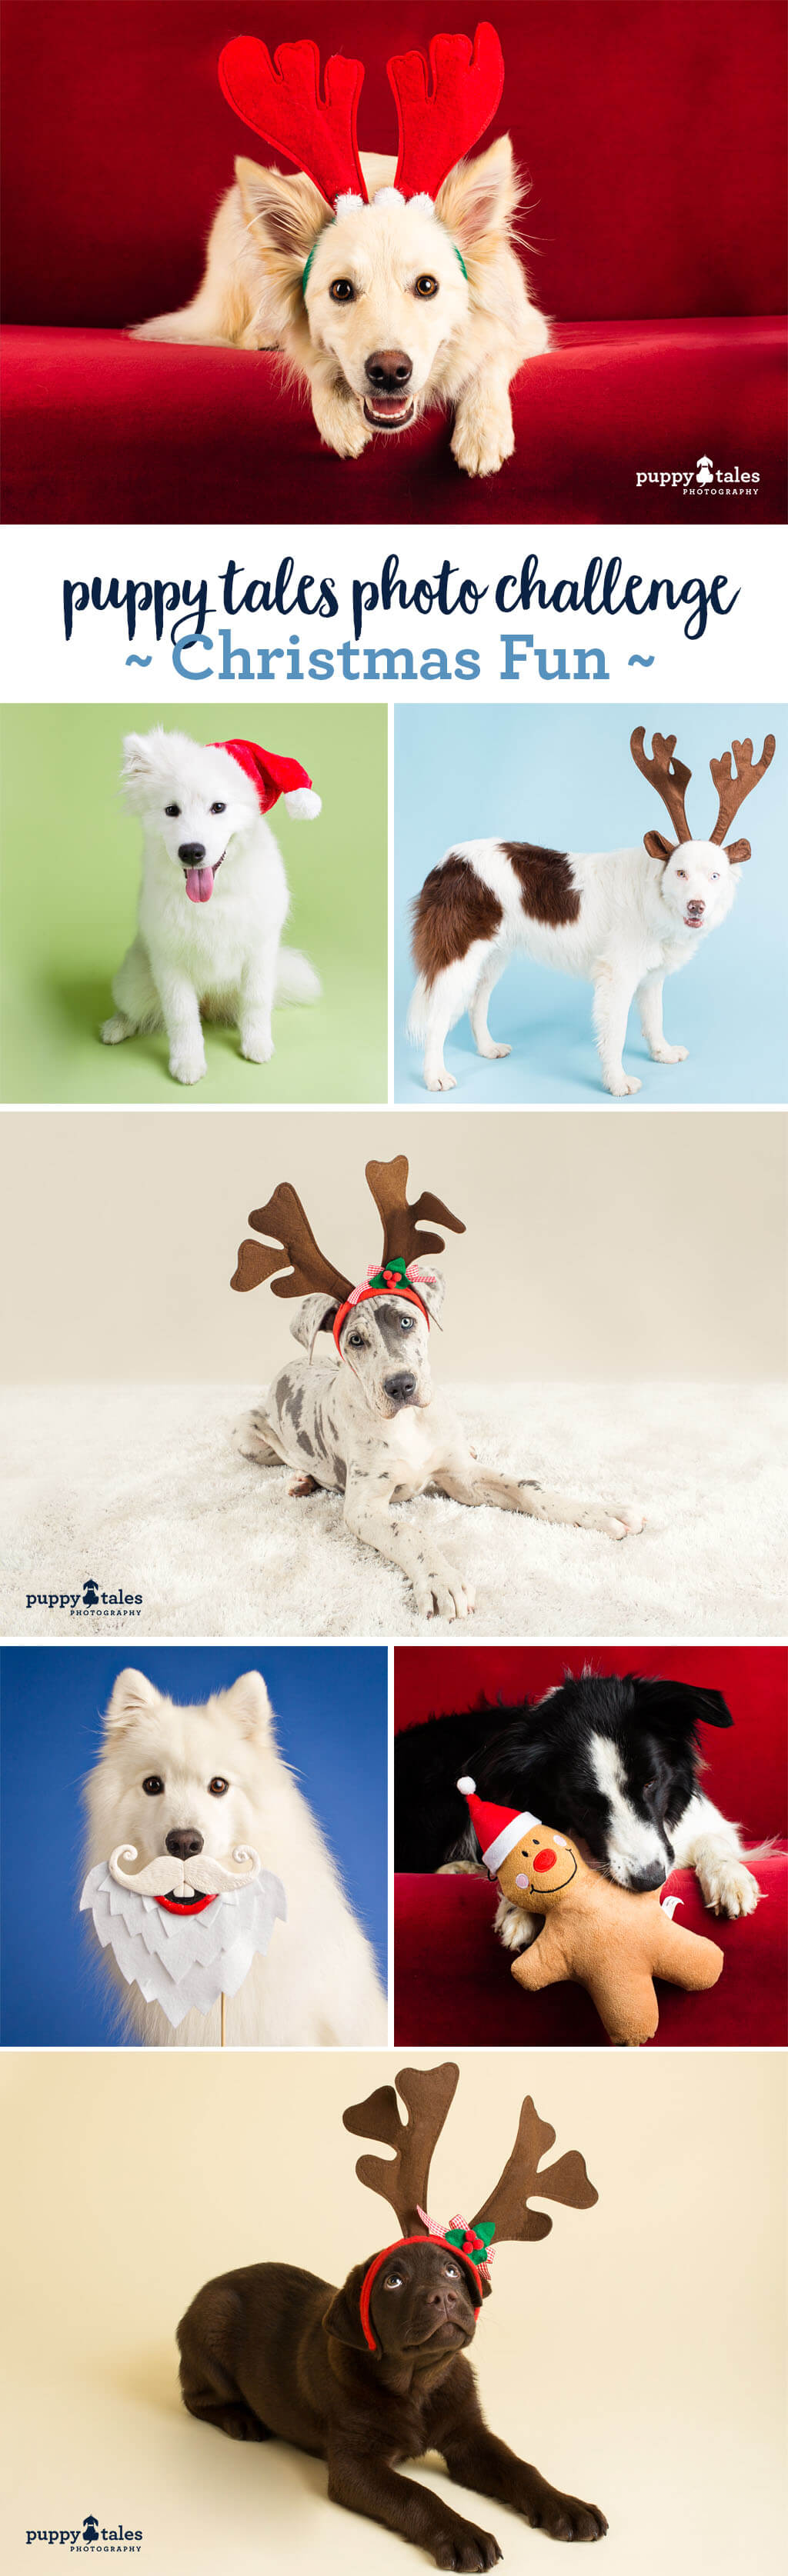 Puppy Tales Photo Challenge ~ Christmas Fun